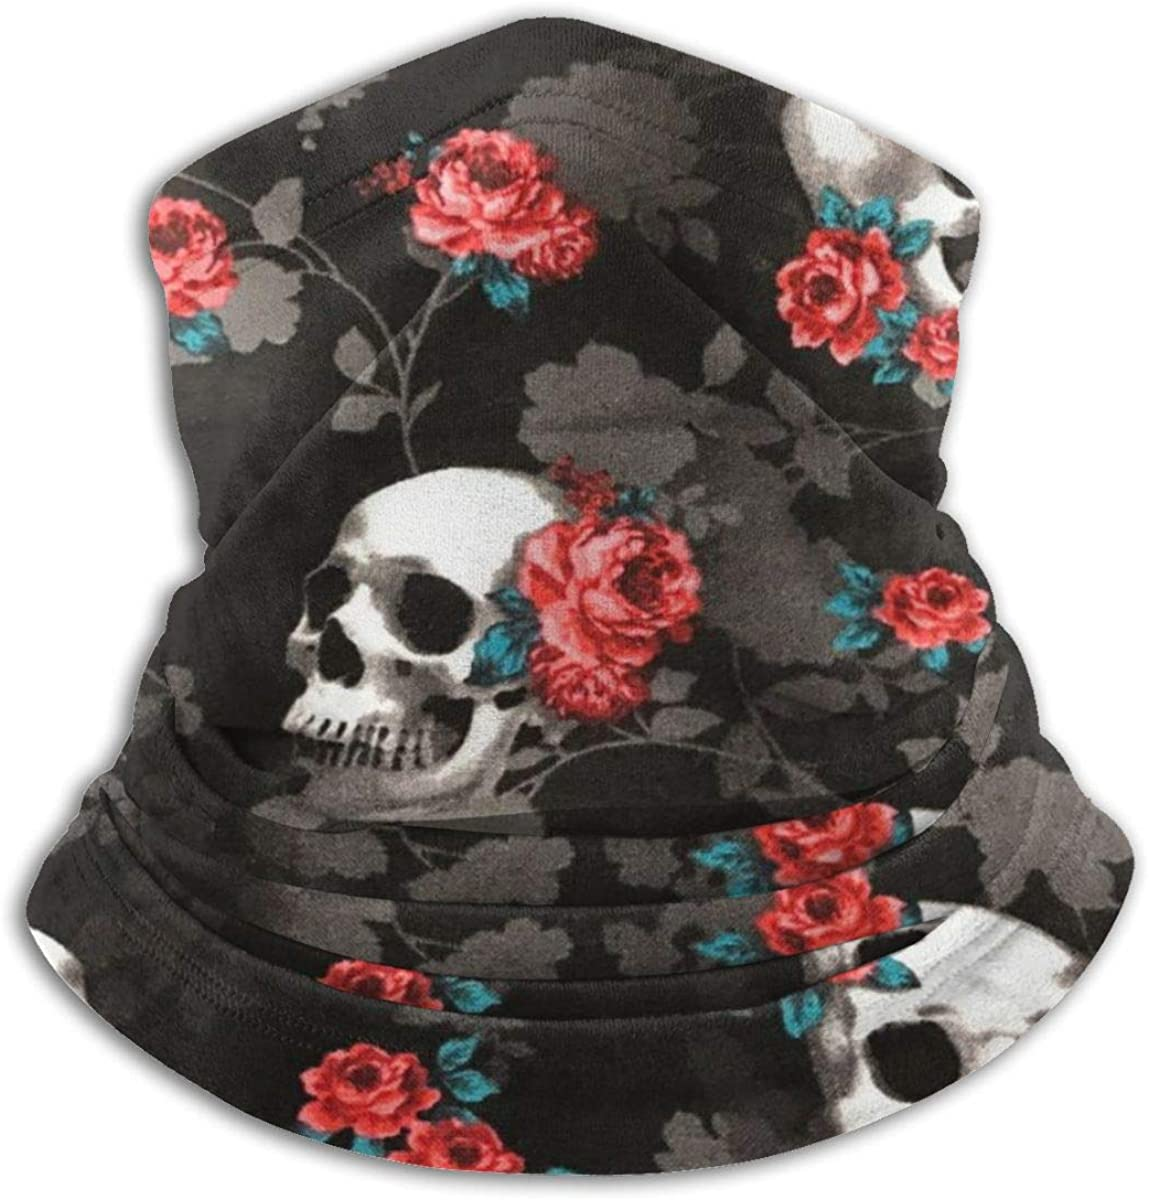 Face Mask, Neck Gaiter, Black Sunflower Bandana, Balaclava Windproof Anti Dust Magic Scarf for Women Men